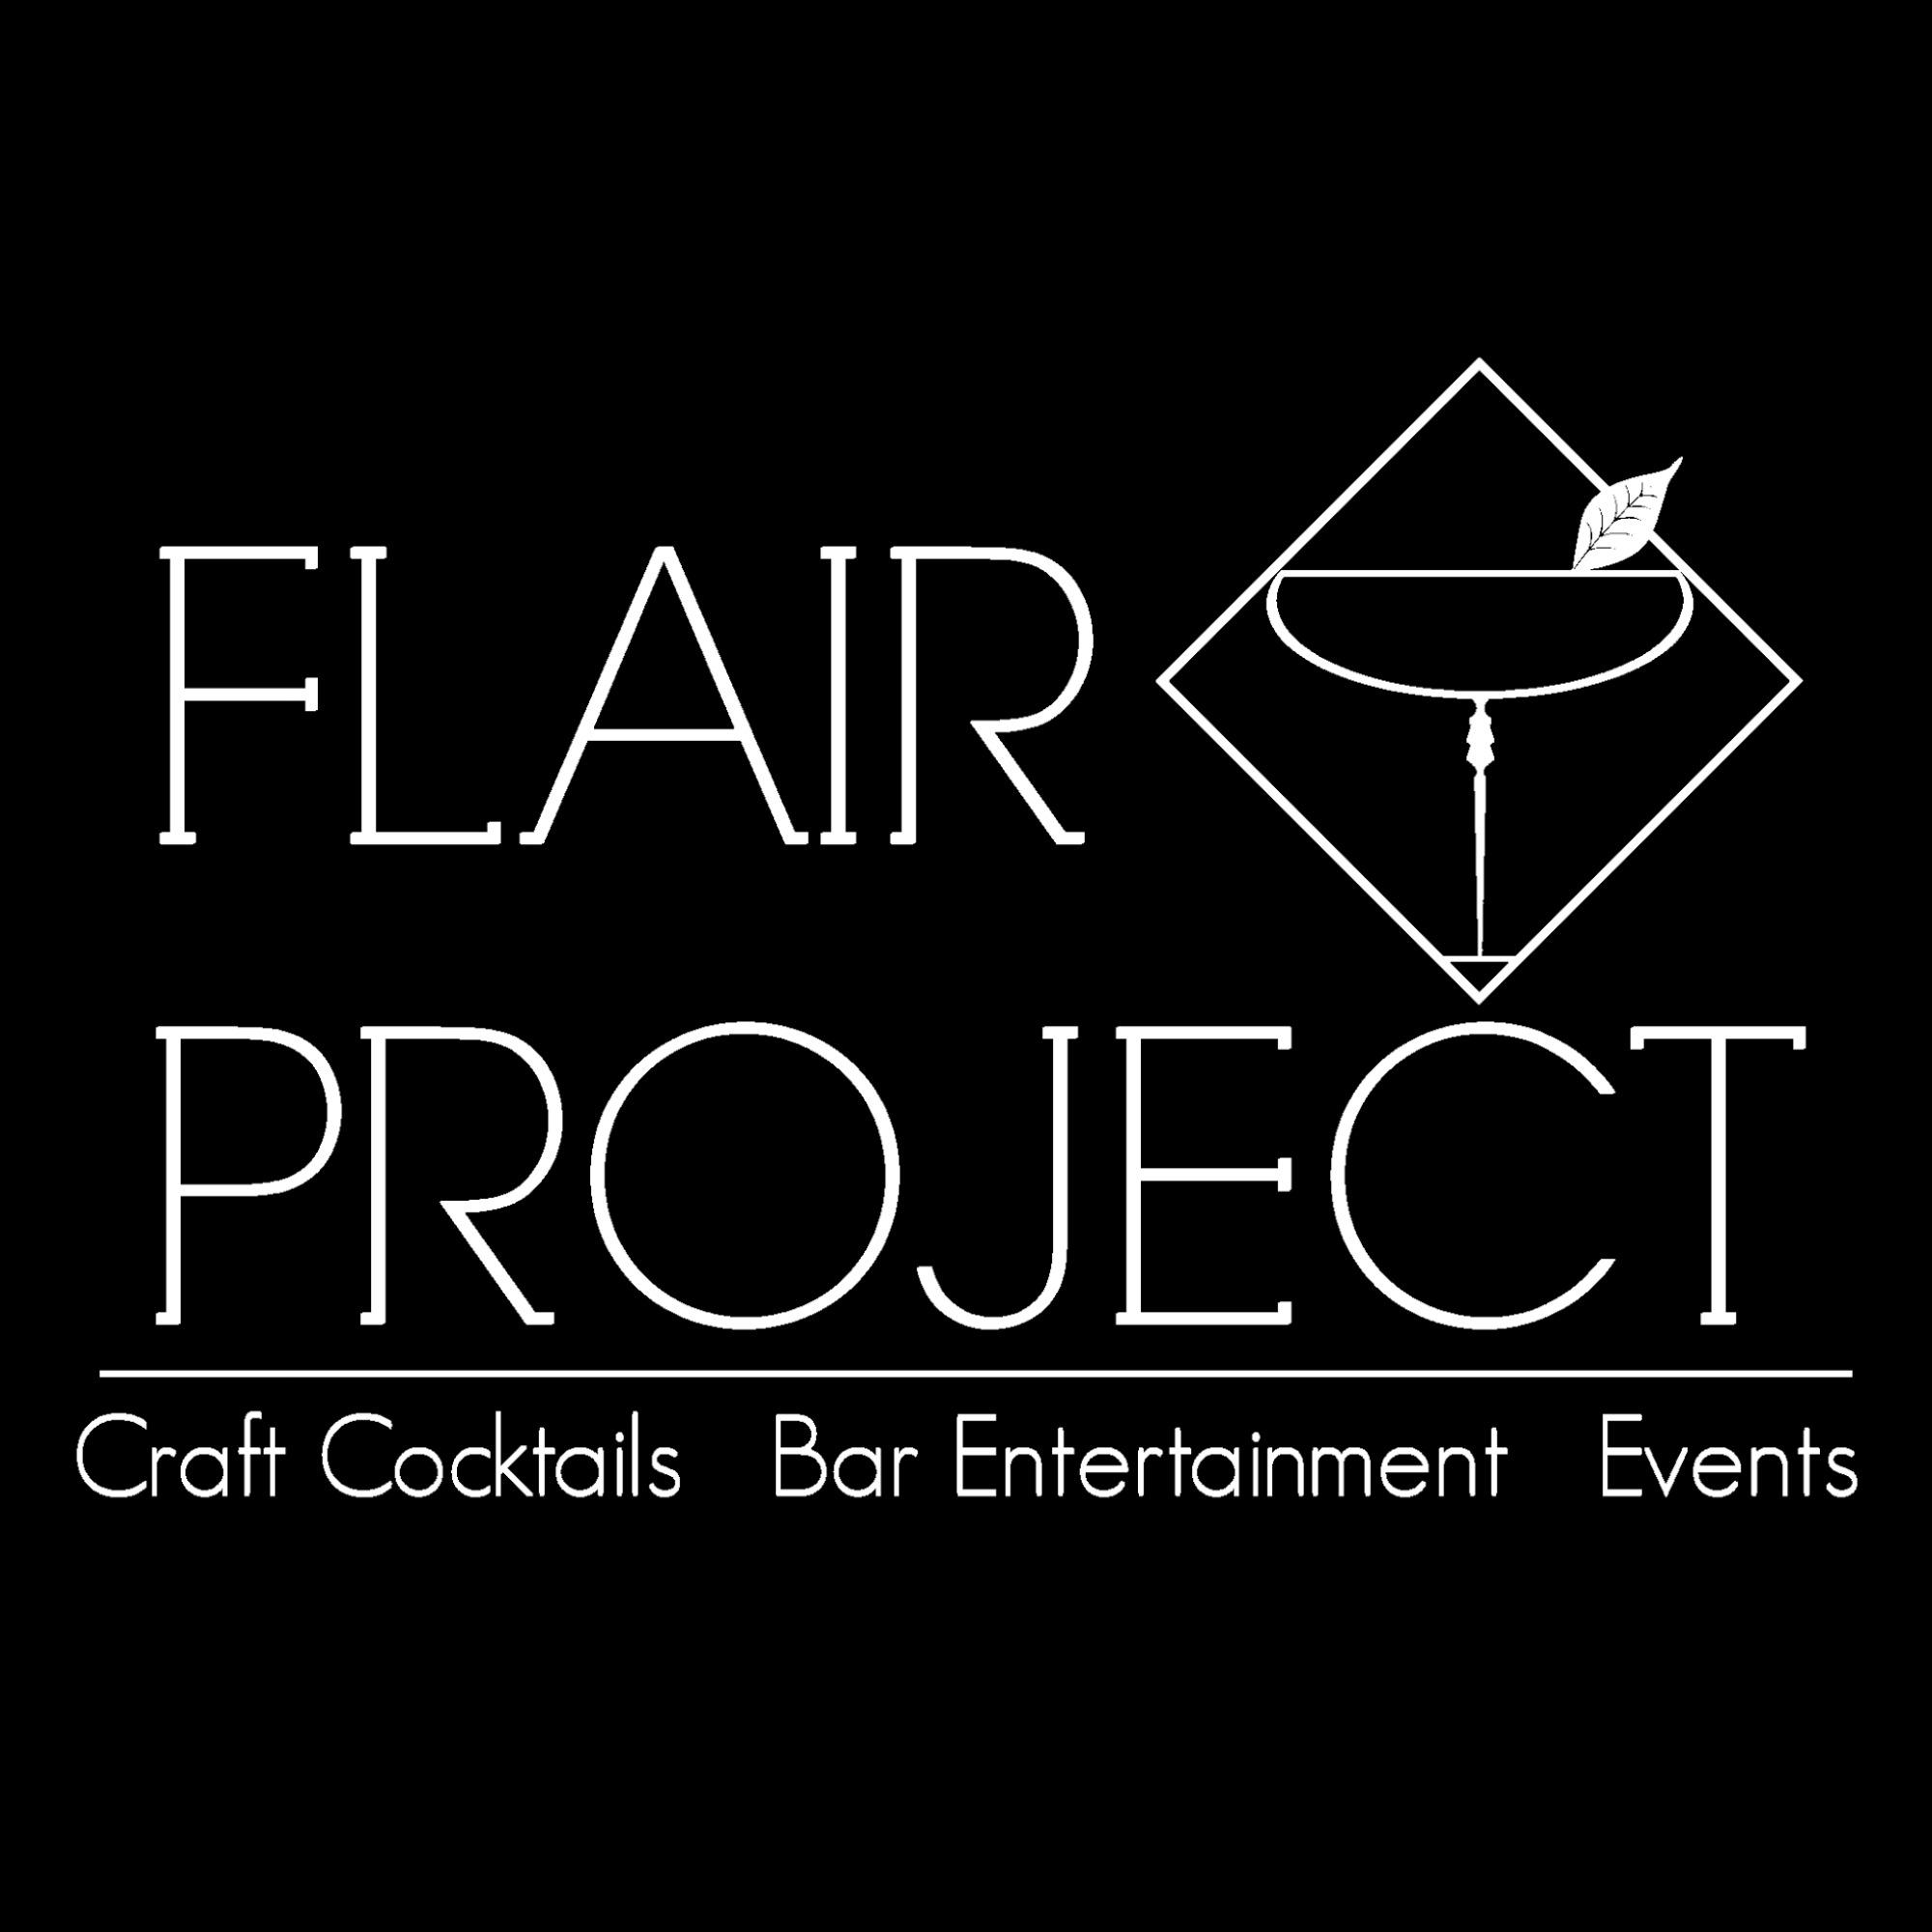 Ilea 2017 - Flair Project